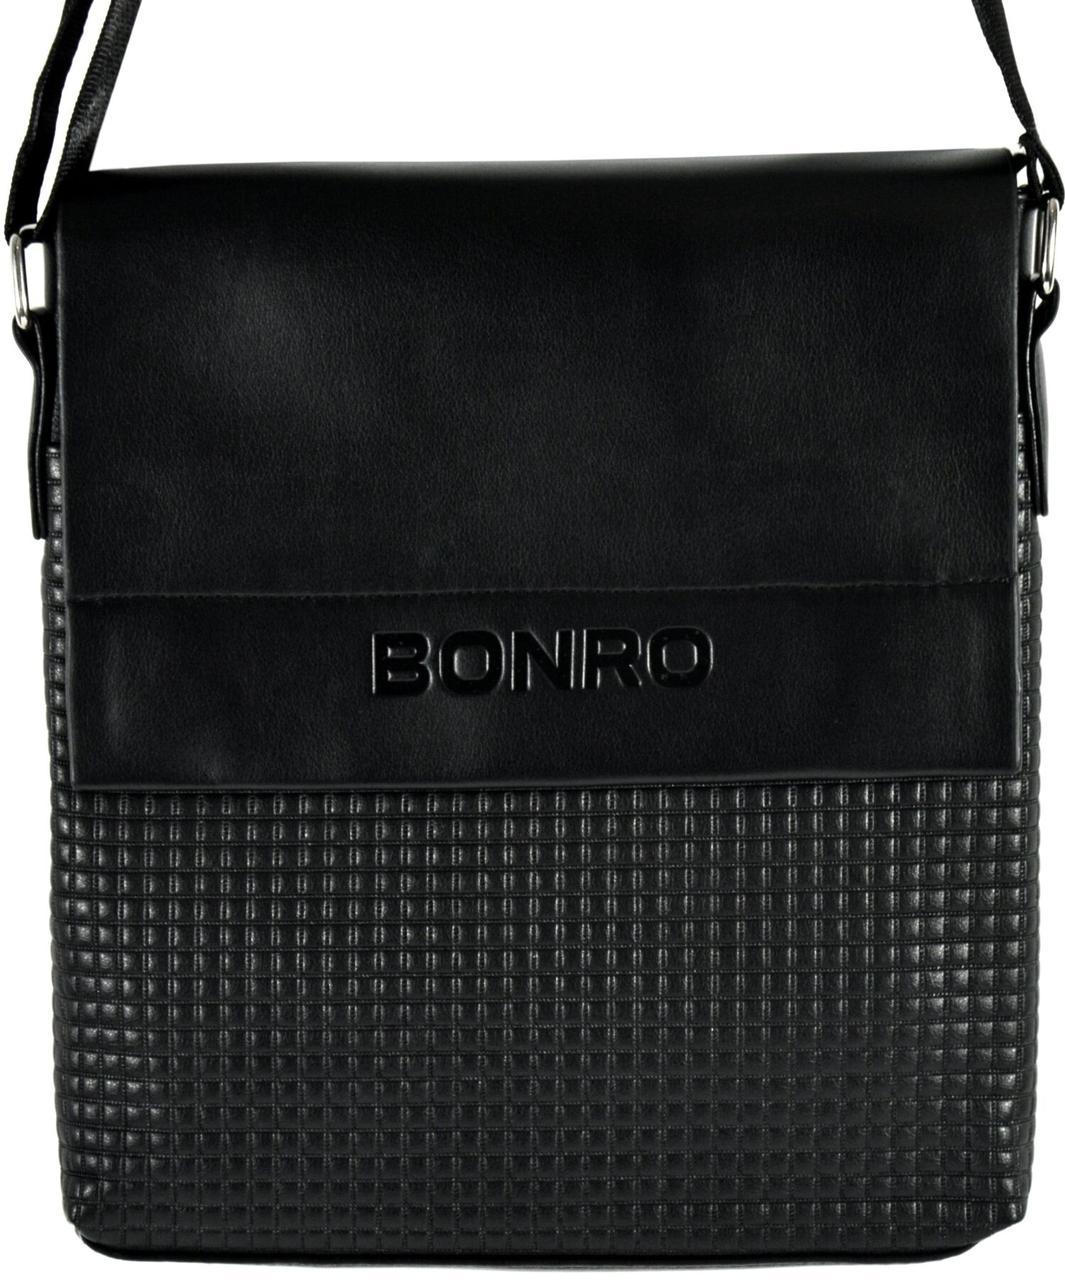 Сумка чоловіча Bonro через плече чорна Model 3 (14000002)